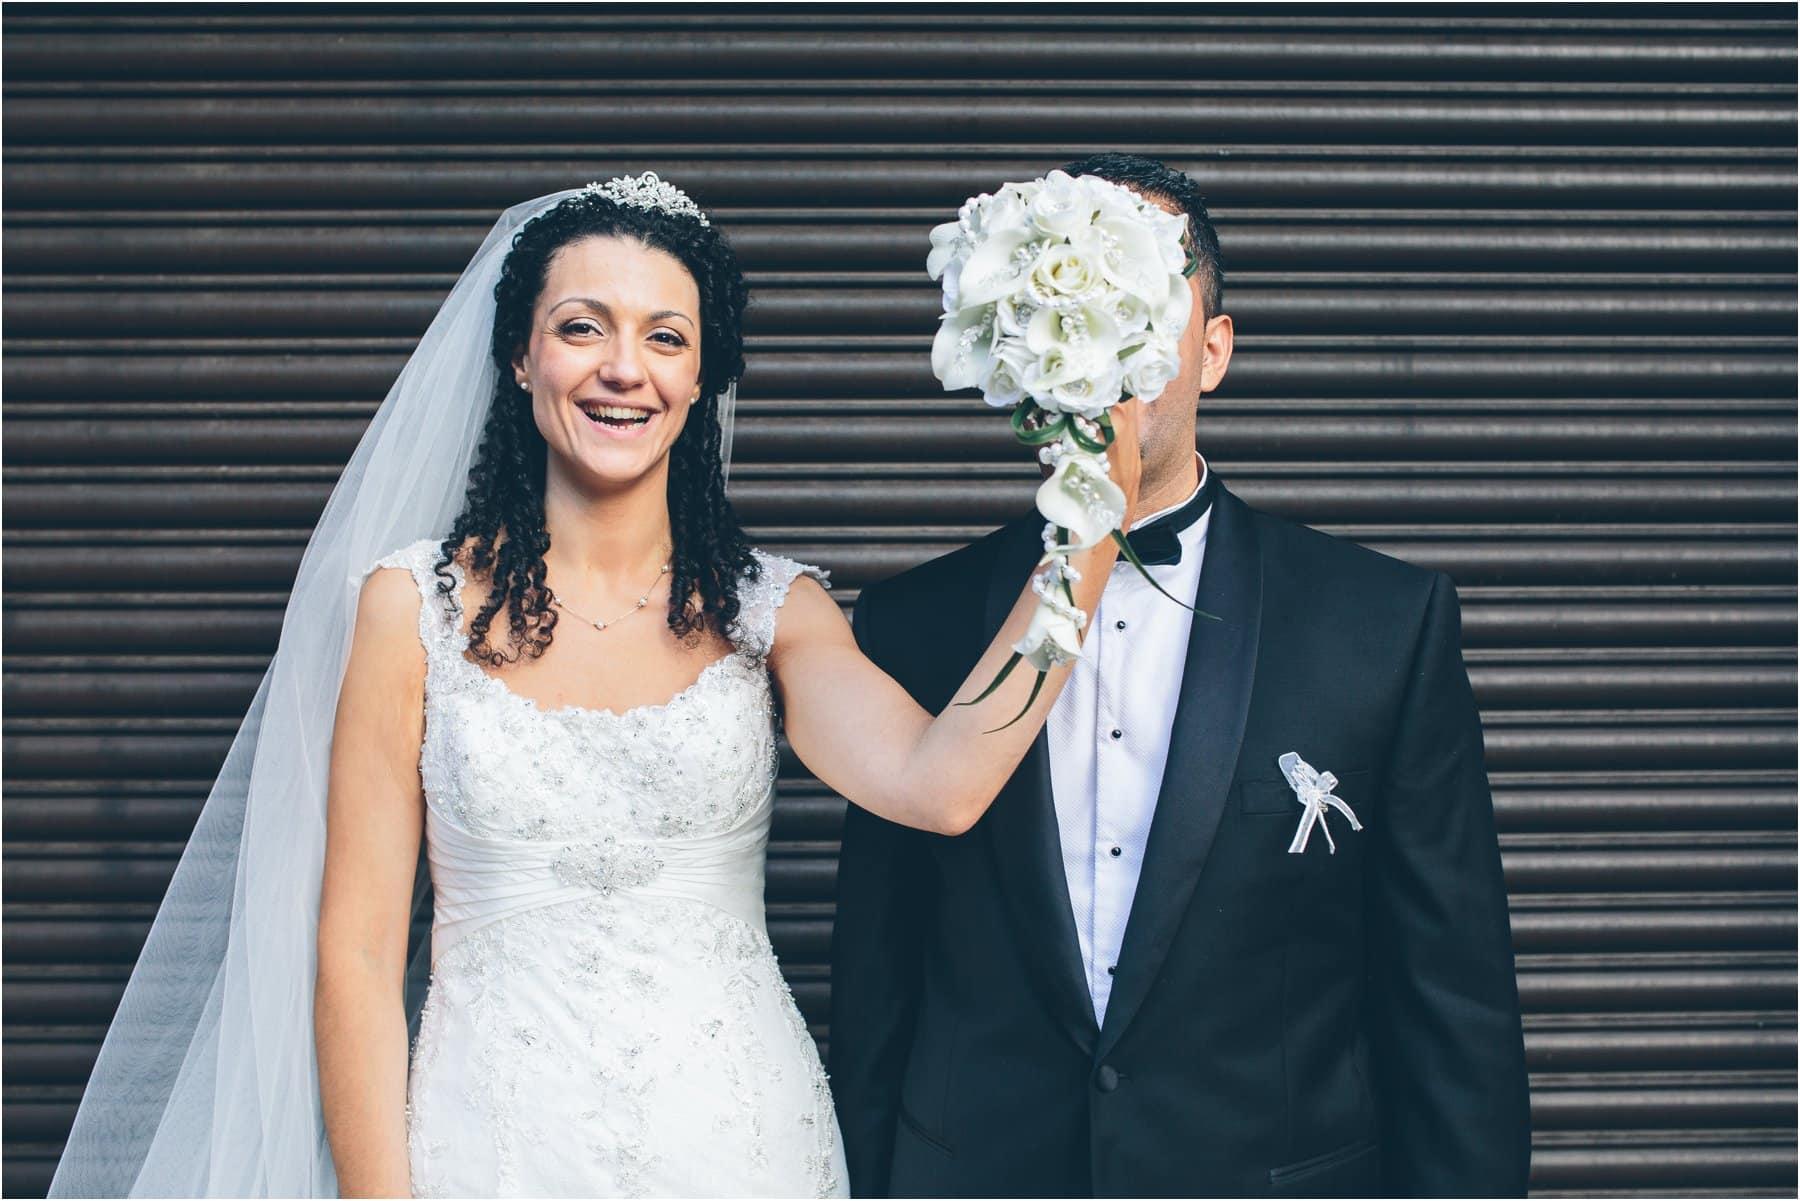 Midland_Manchester_Wedding_Photography_0085